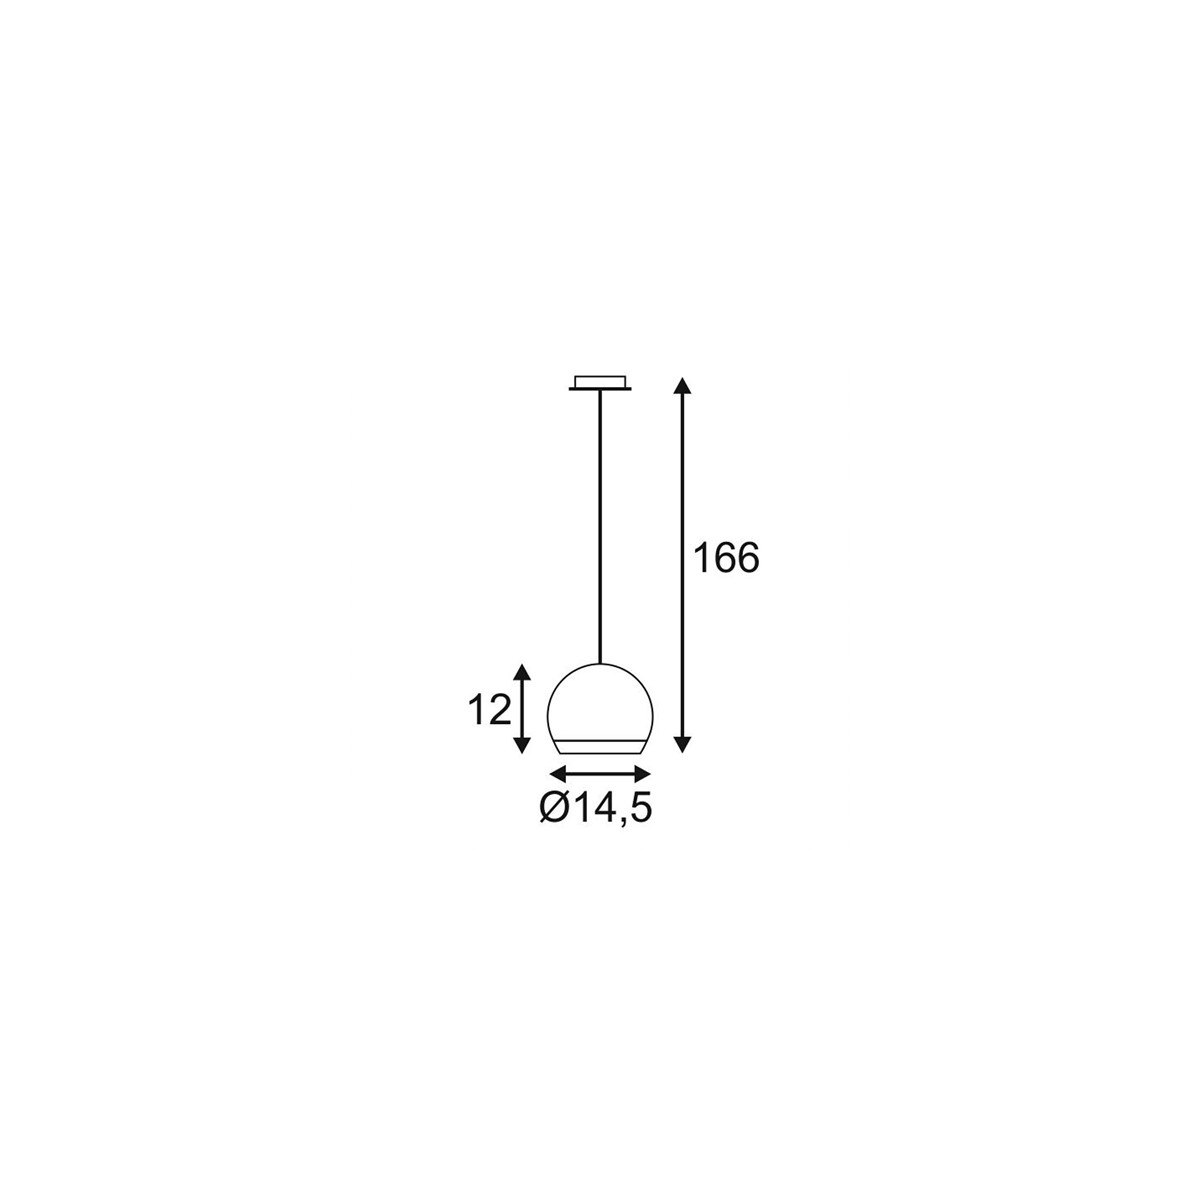 SPOTLINE/SLV LIGHT EYE Chrom. GU10. max. 75W 133482 Wisząca